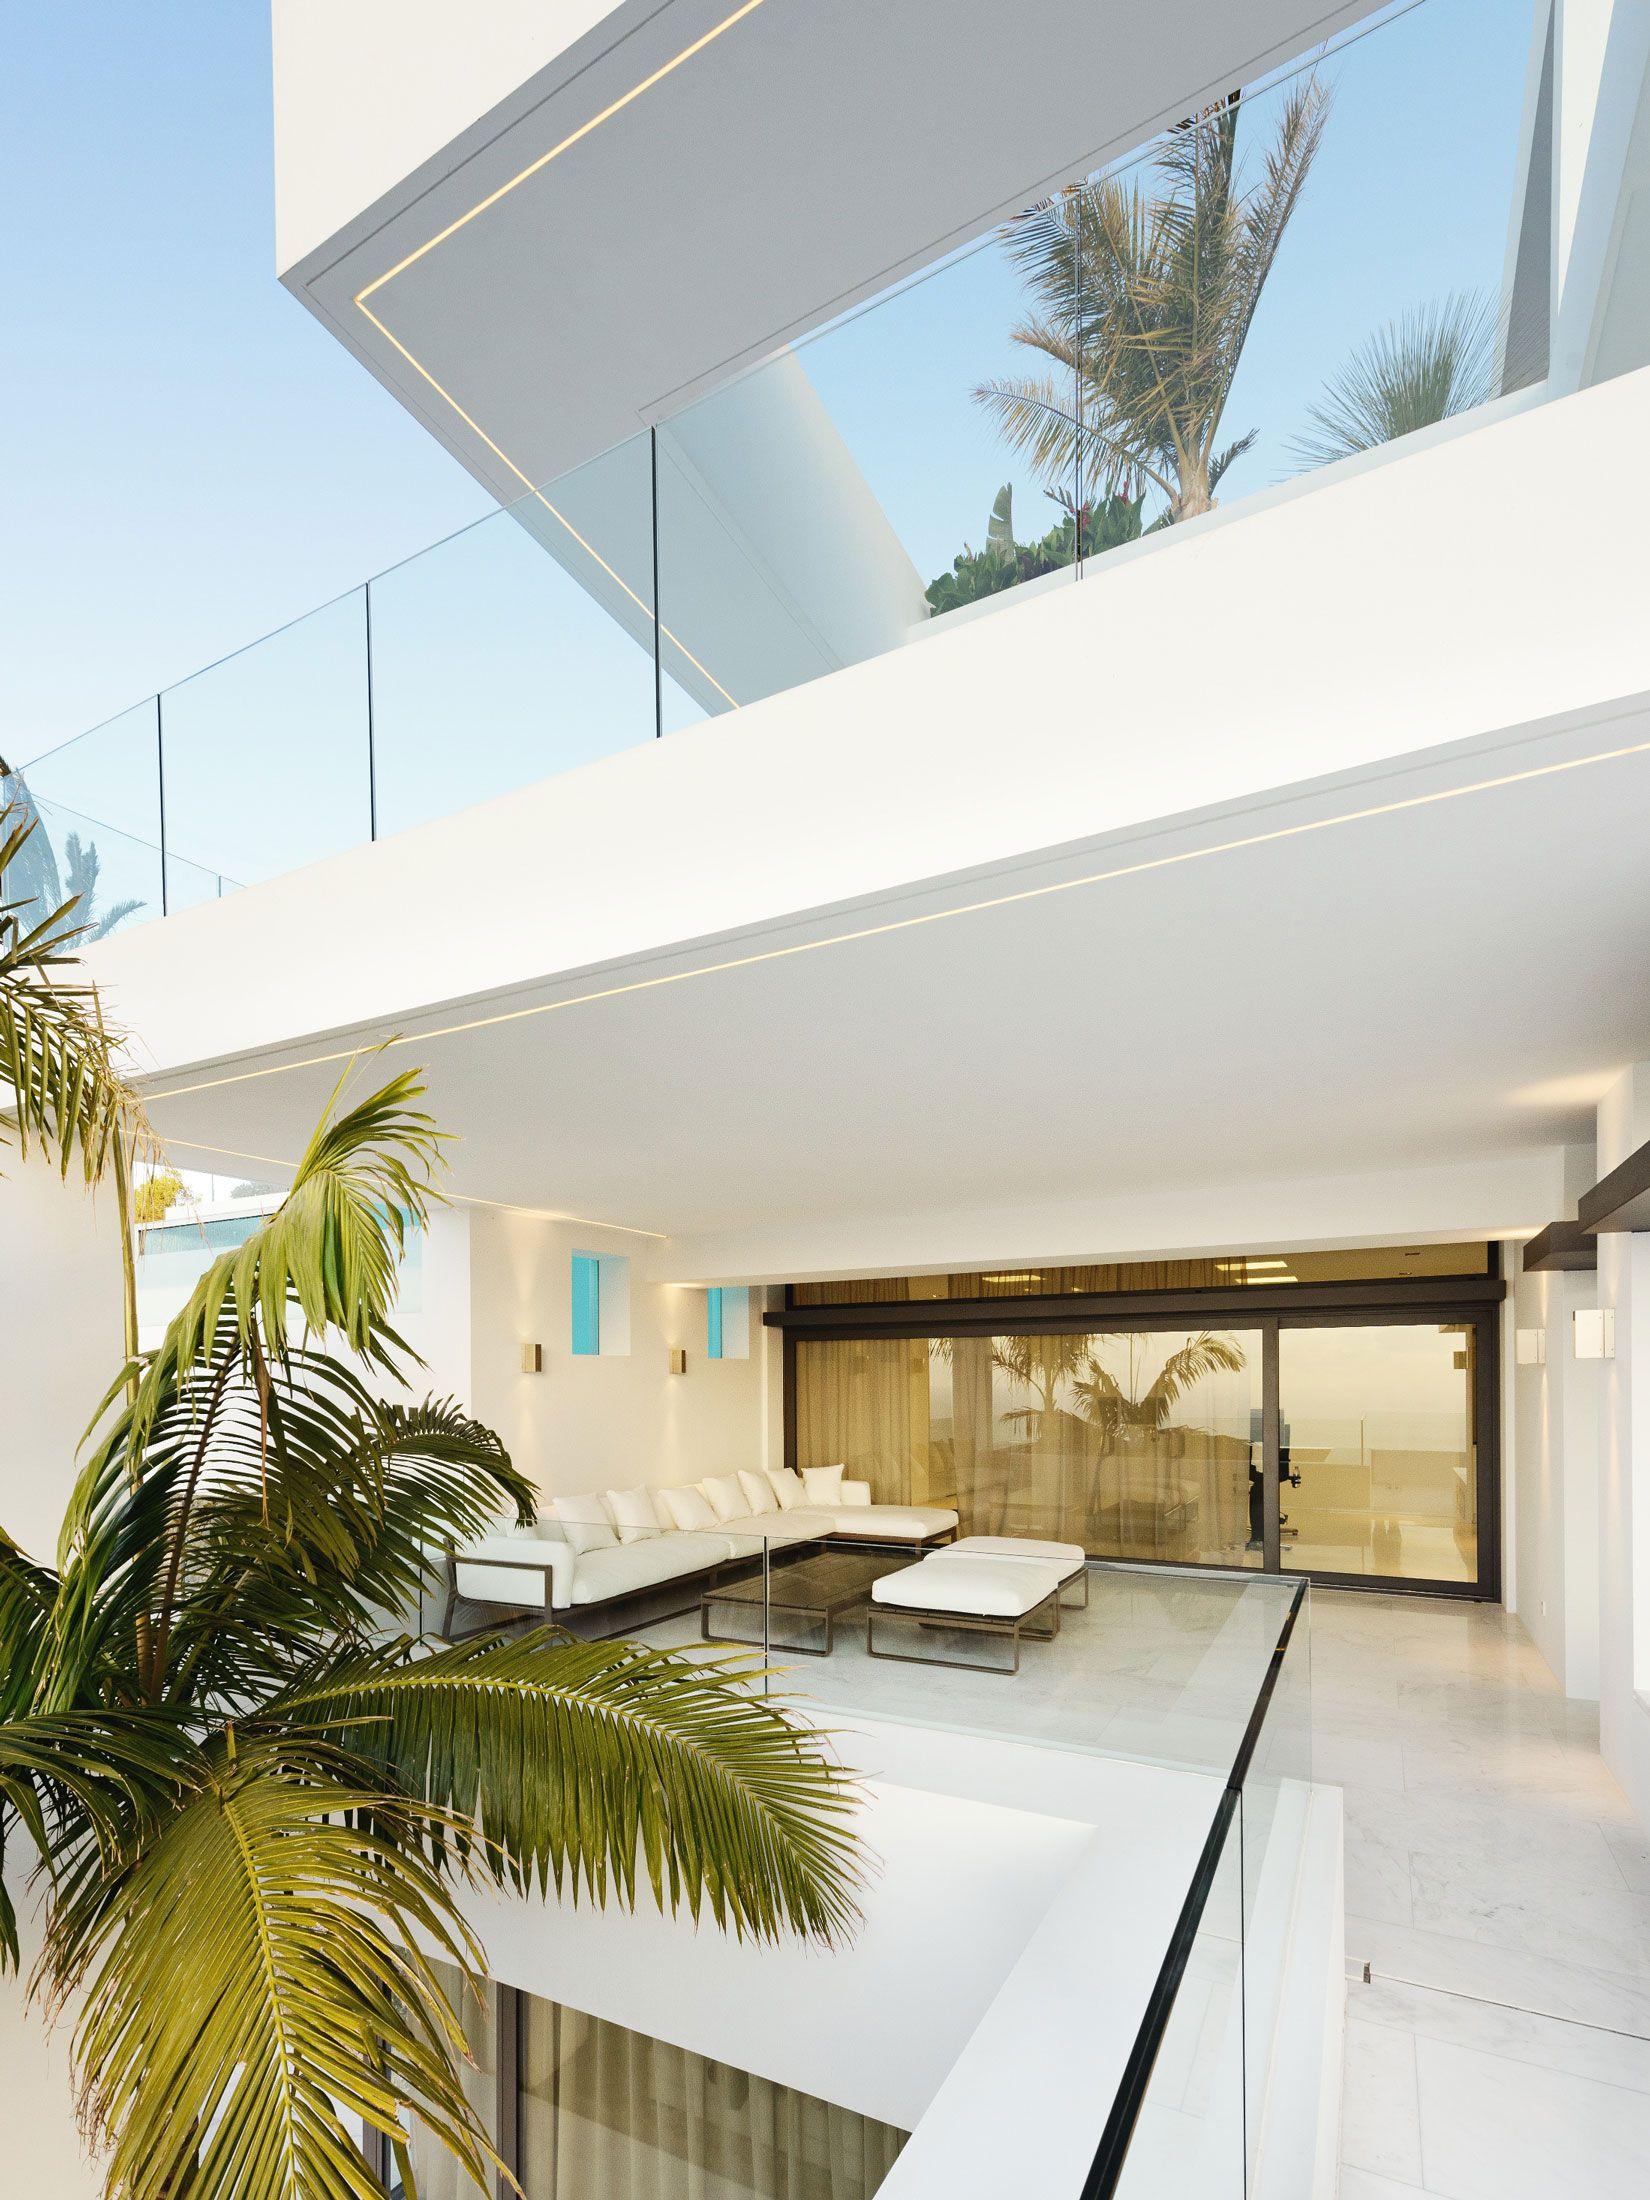 The cliff house by altea hills estate home designinterior